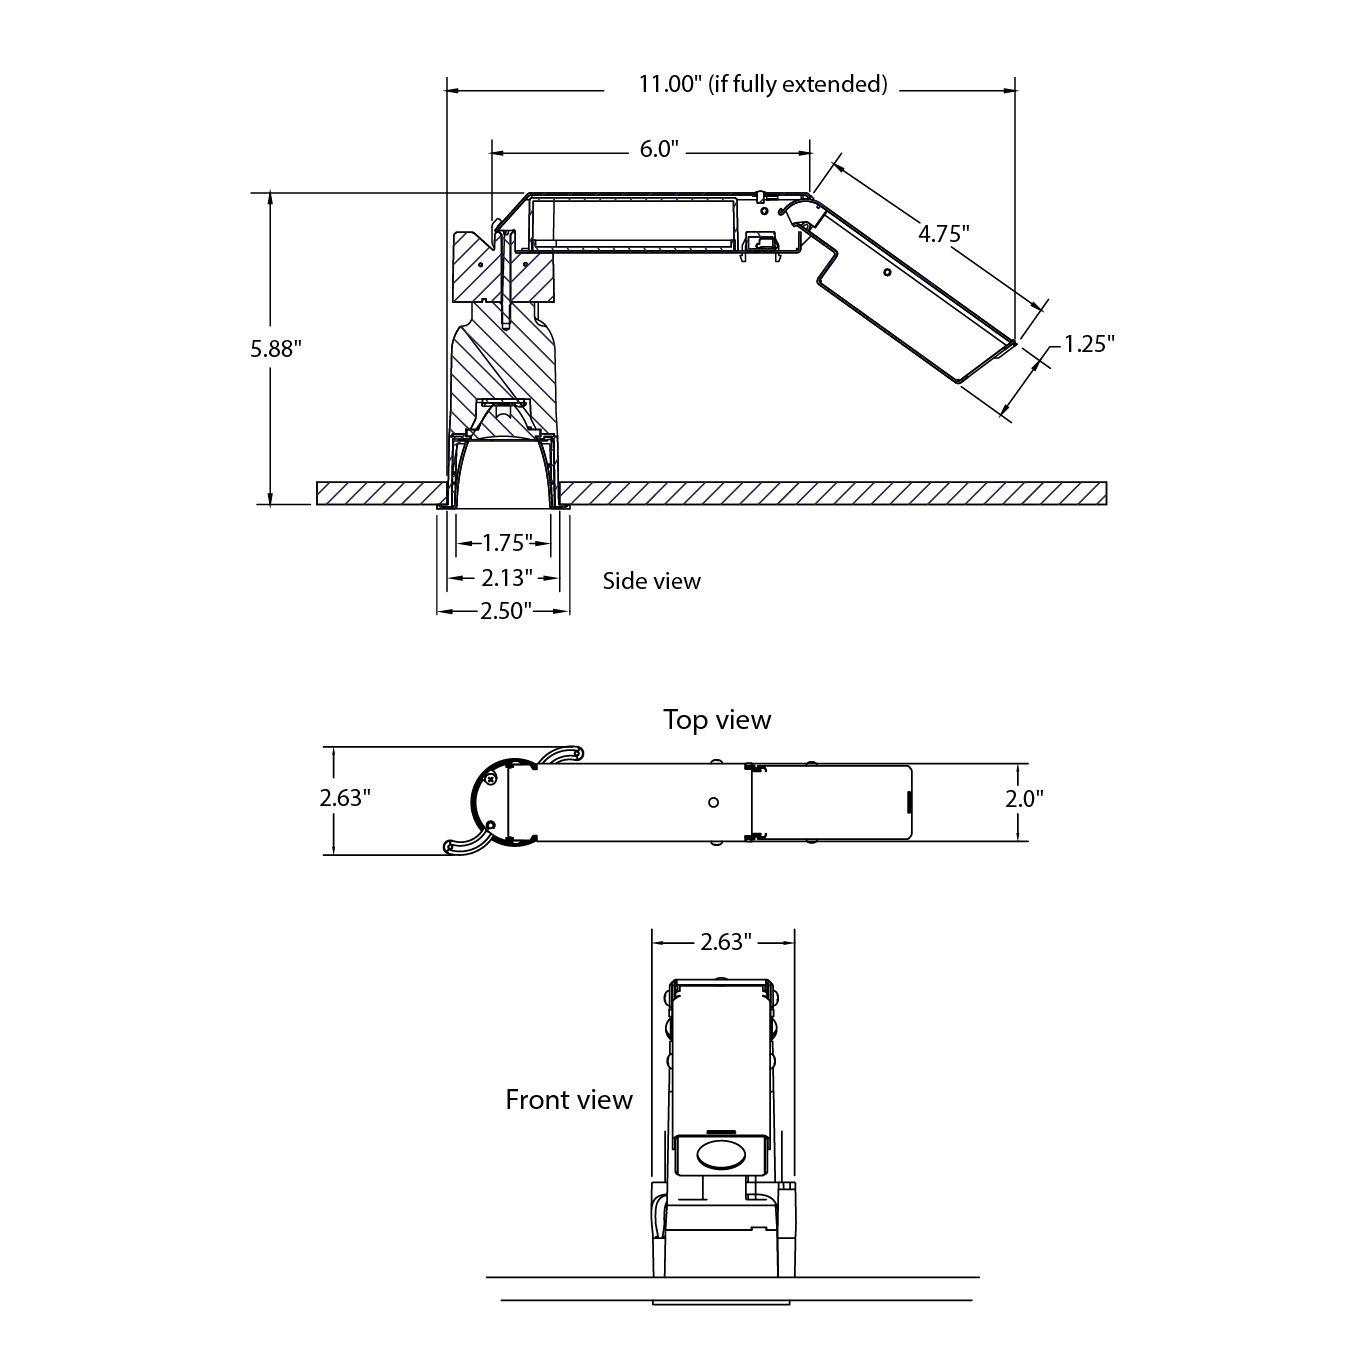 Lightolier Calculite C2x2l Square 1 75 Inch Aperture Led Recessed Open Downlight 400 Lumens